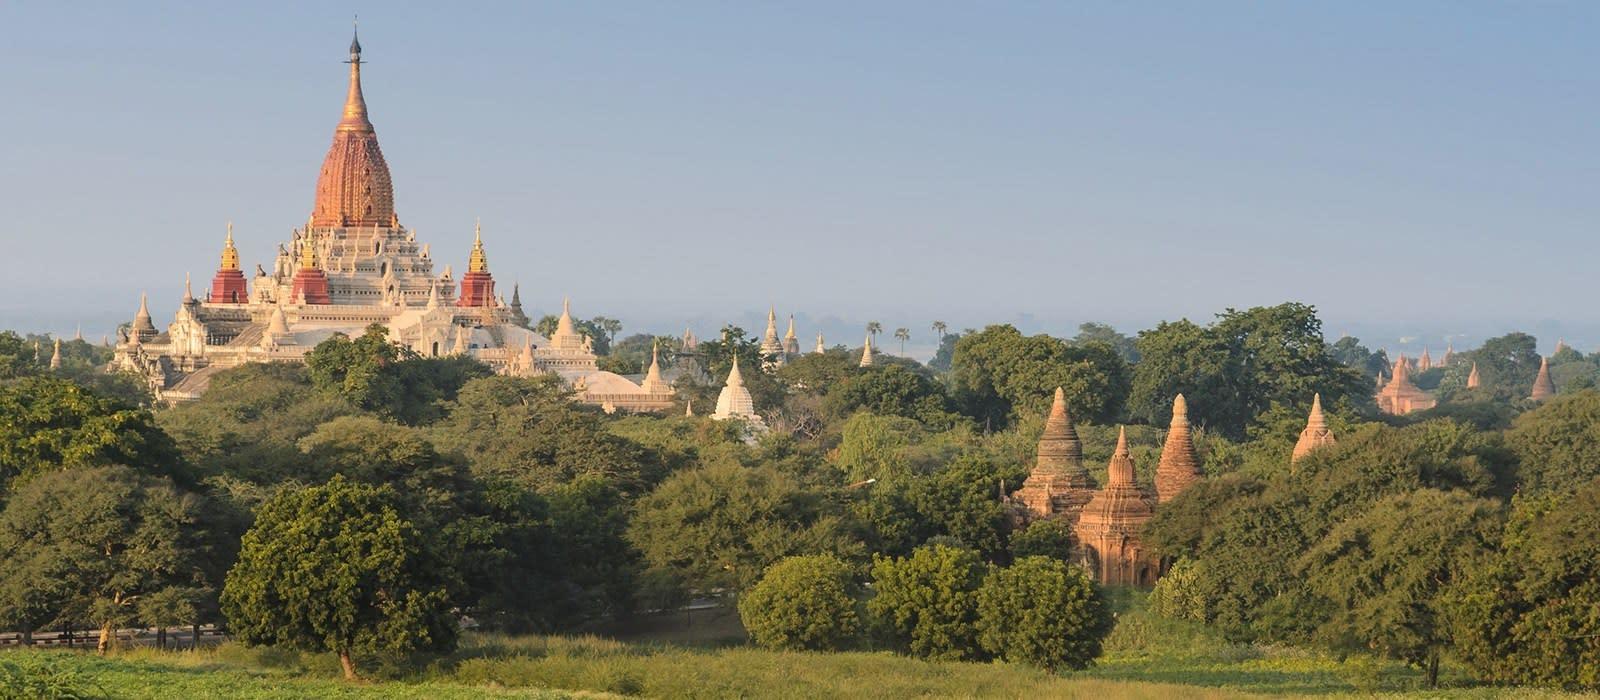 Reiseziel Bagan Myanmar